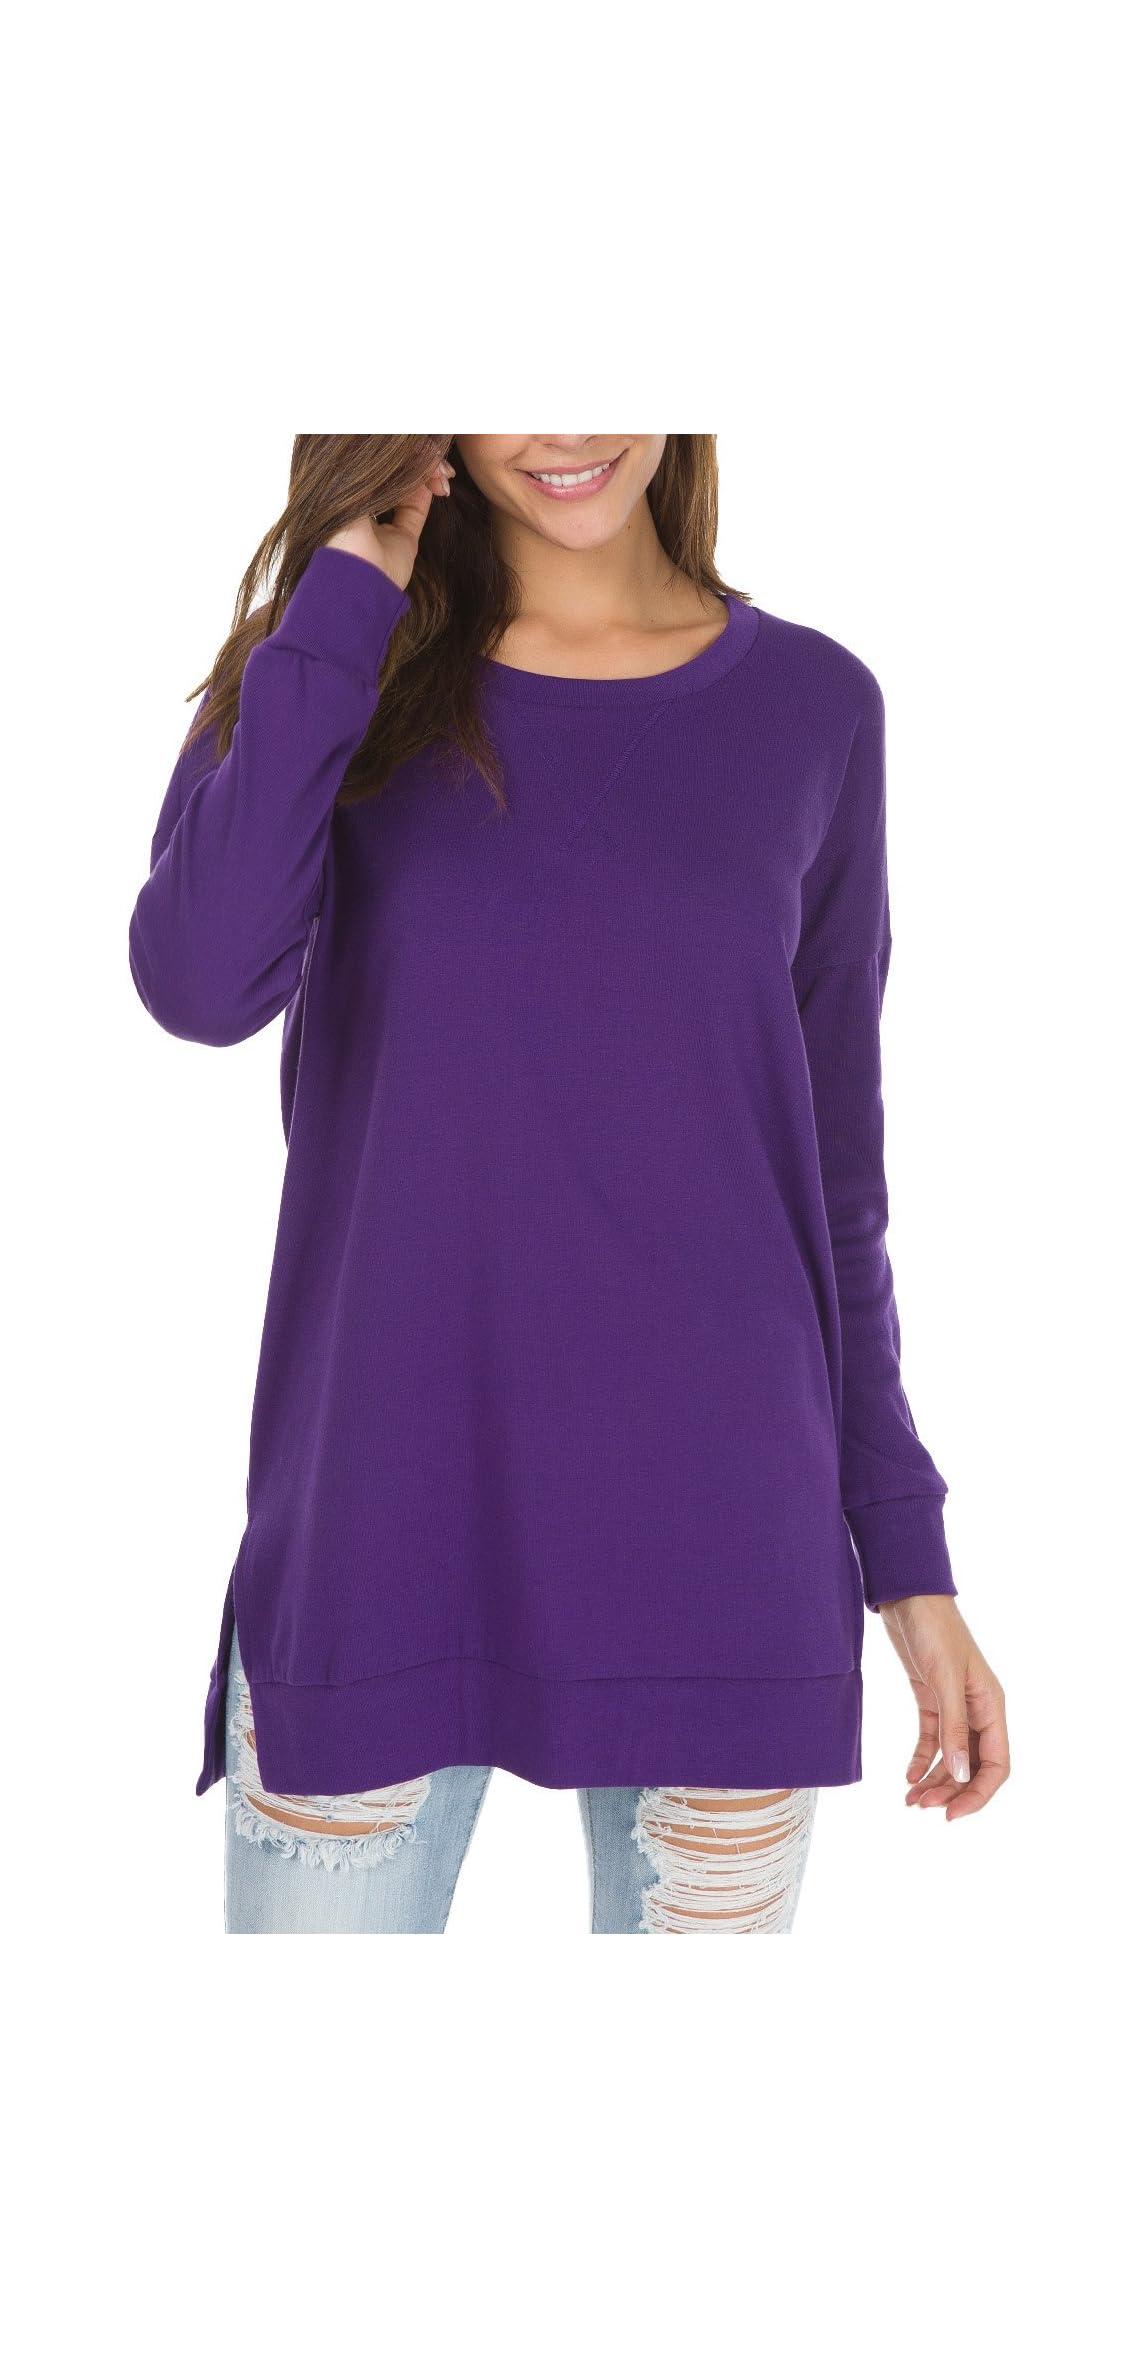 Women's Fall Long Sleeve Side Split Loose Casual Pullover